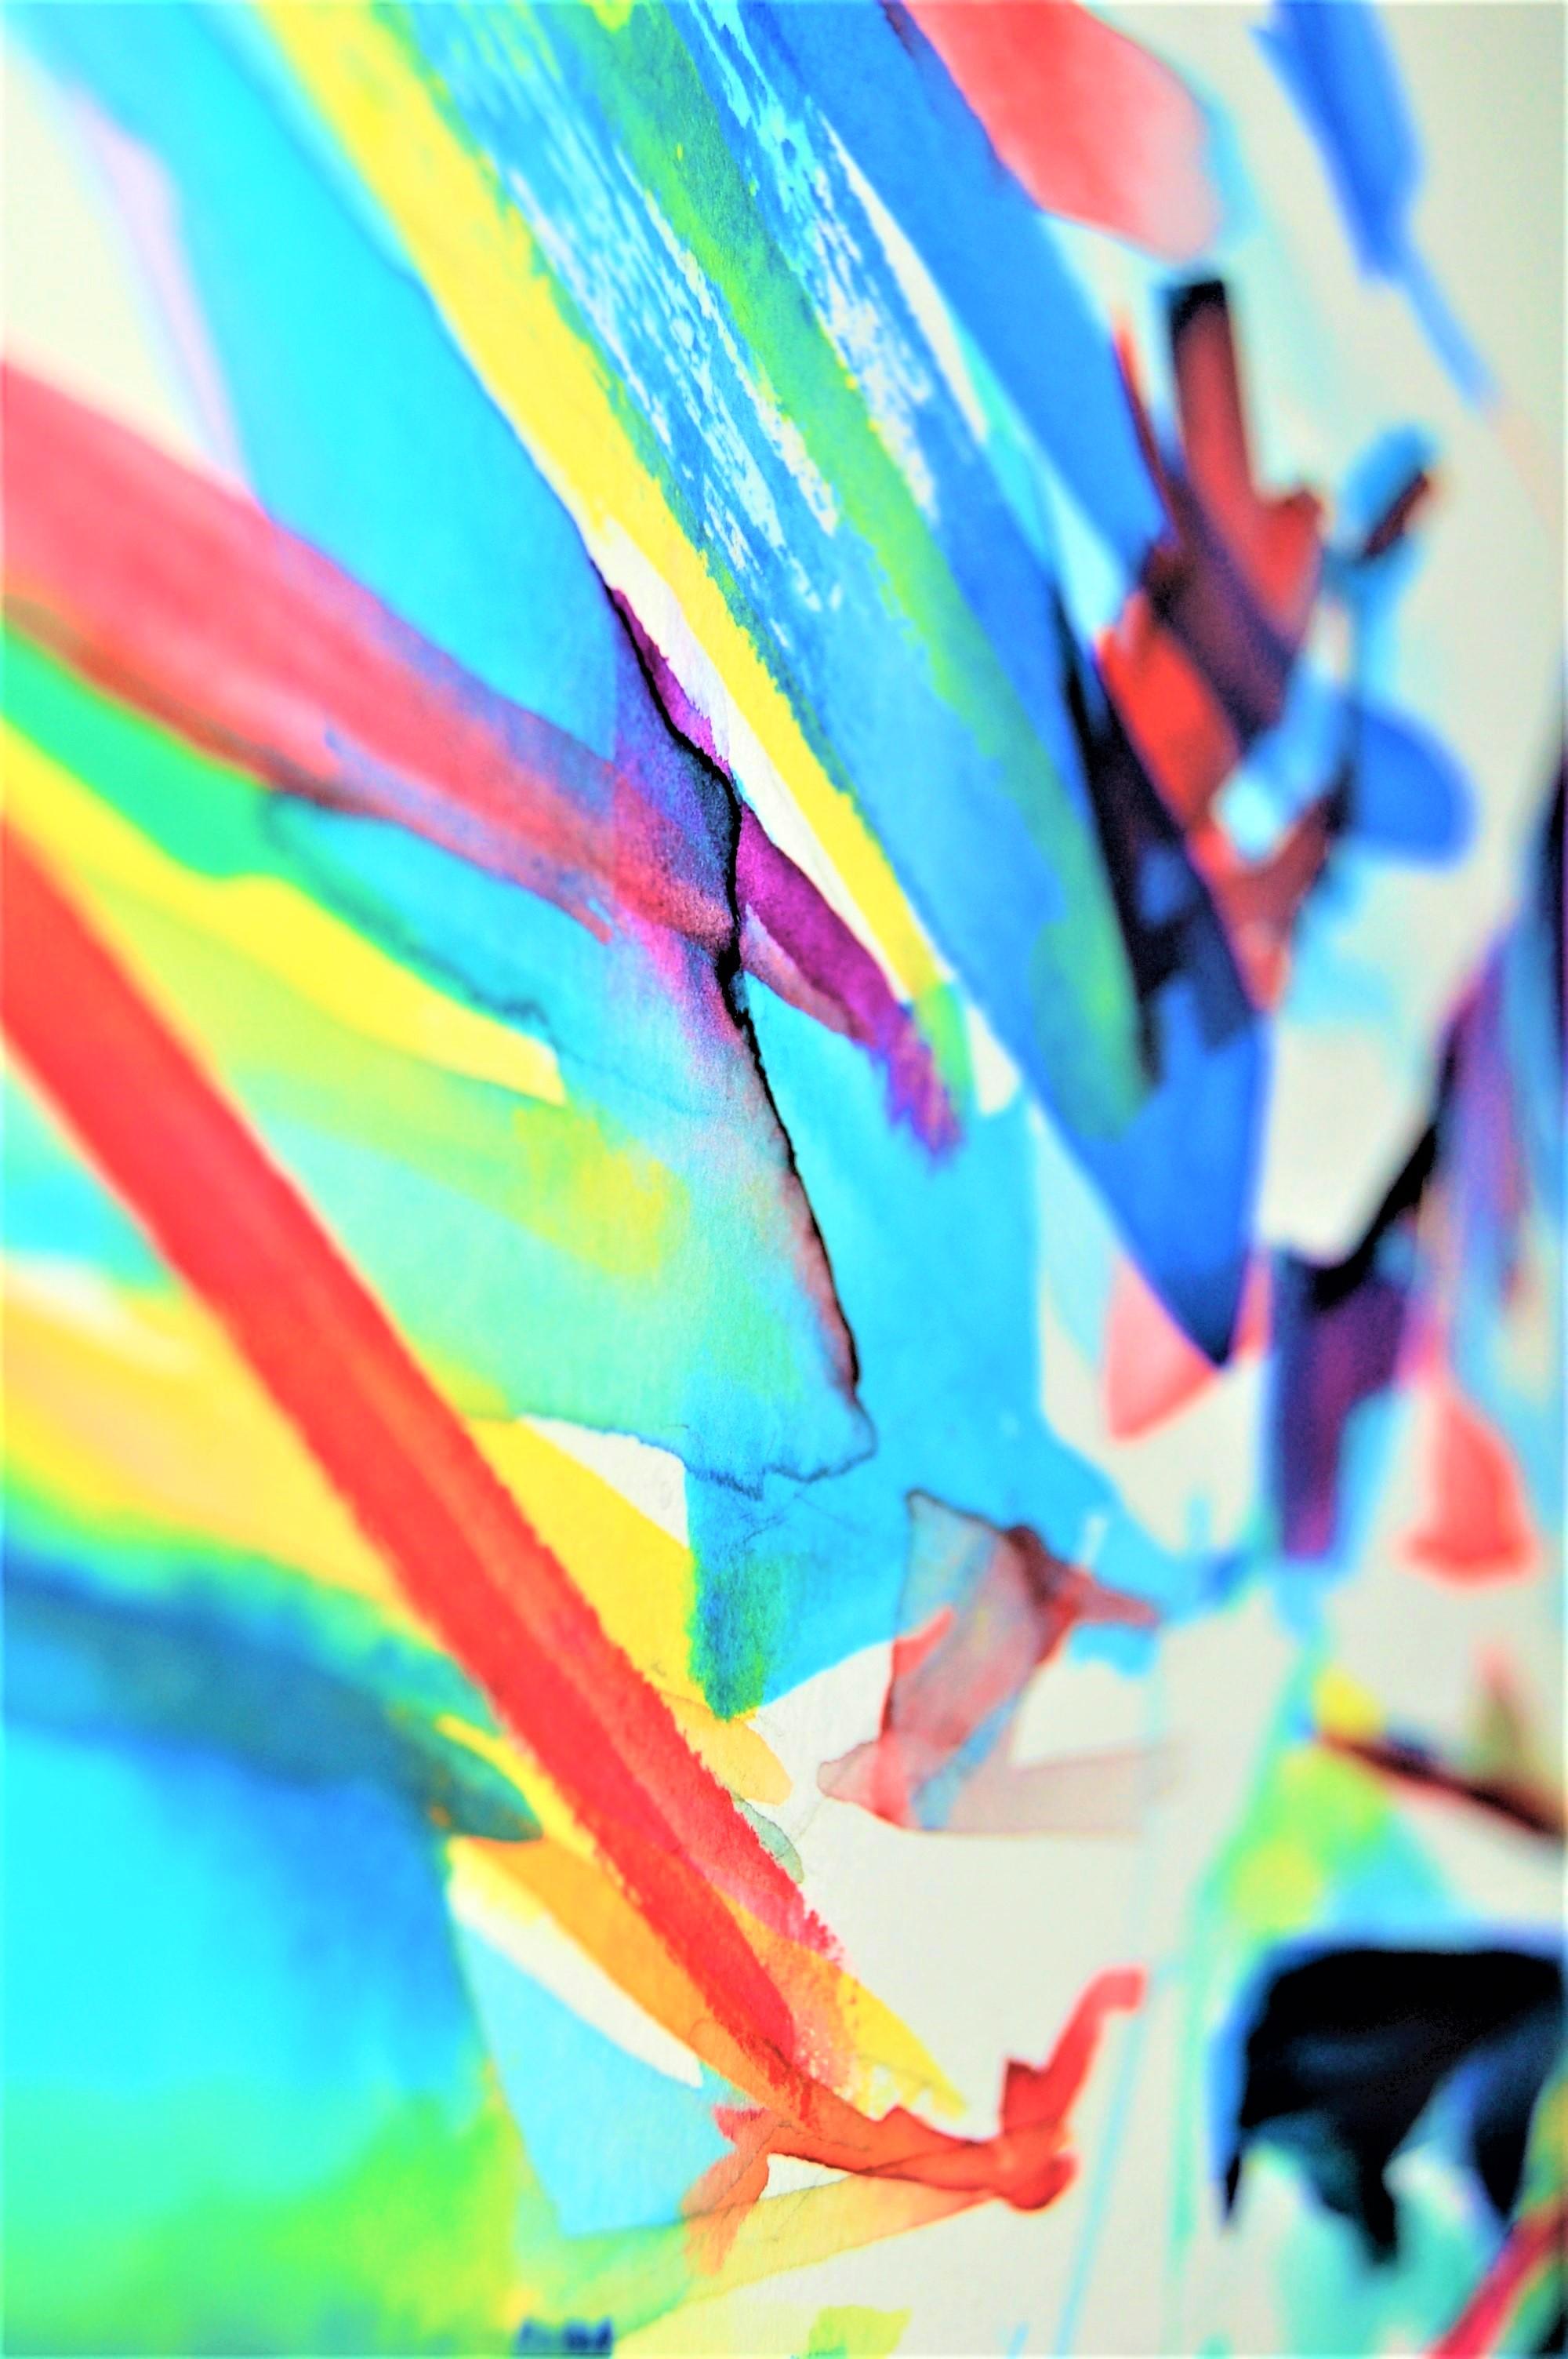 Joanna Craig, Fine artist and designer